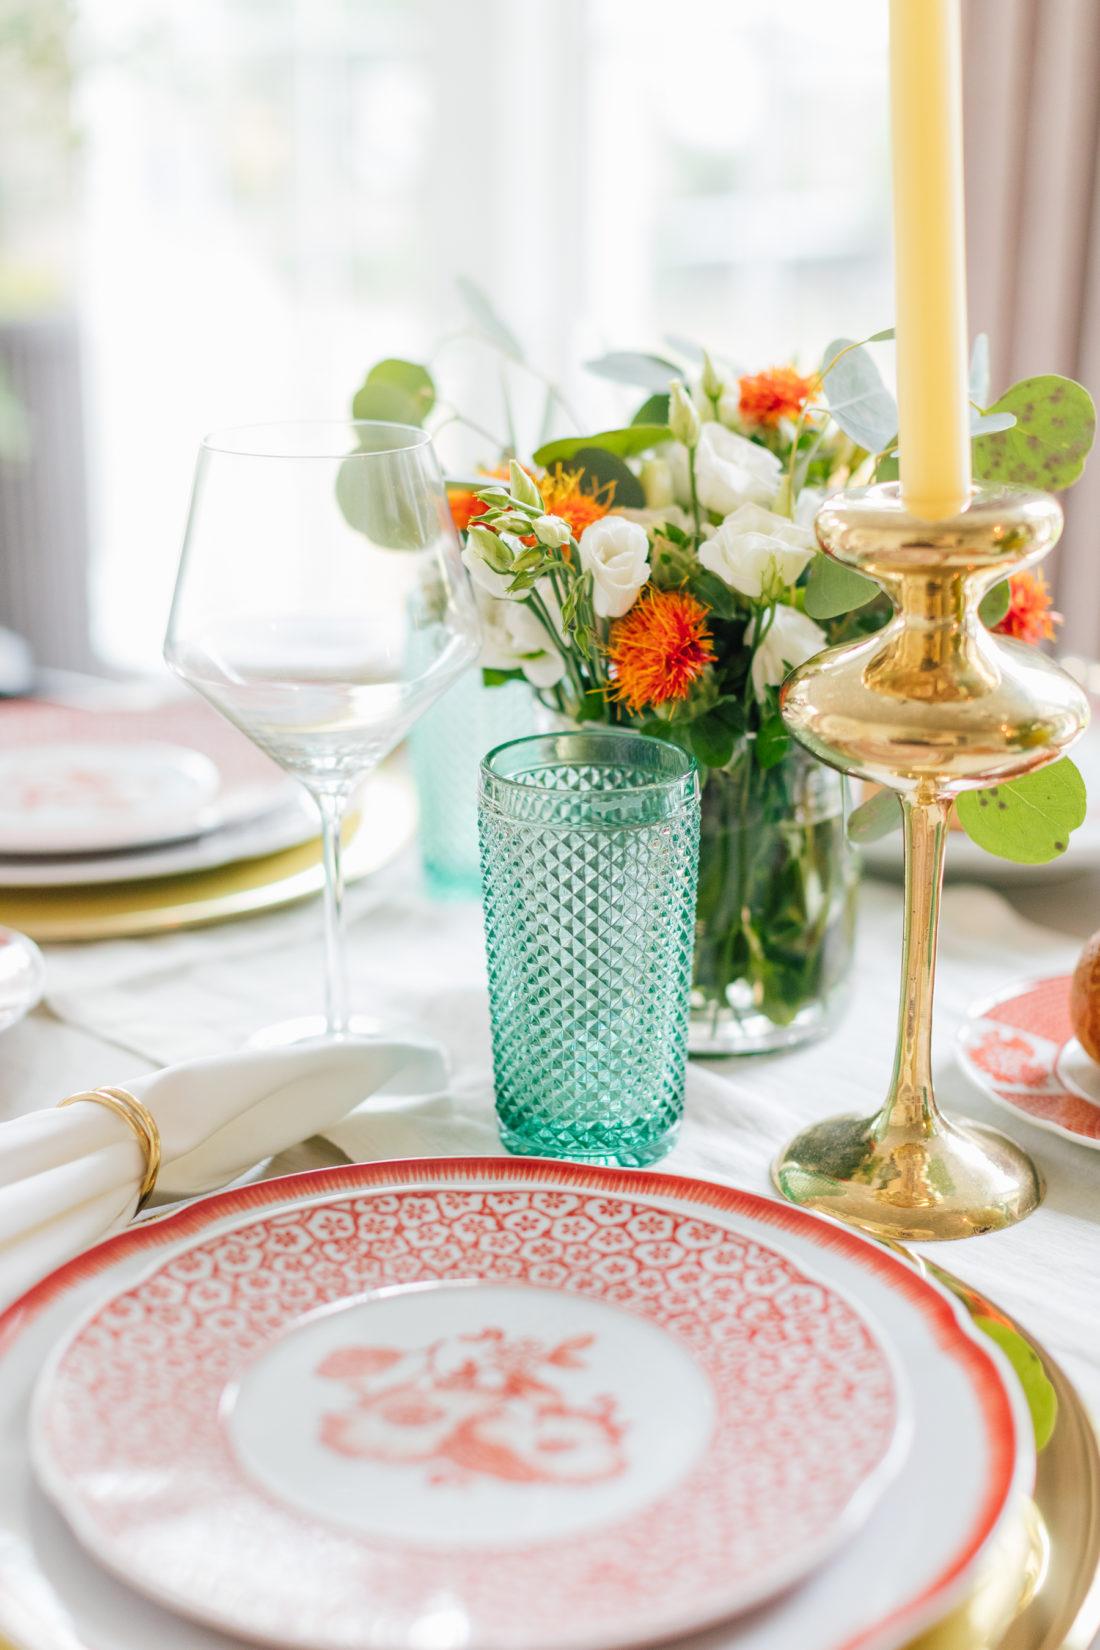 The decor details on Eva Amurri Martino's 2019 Thanksgiving Table